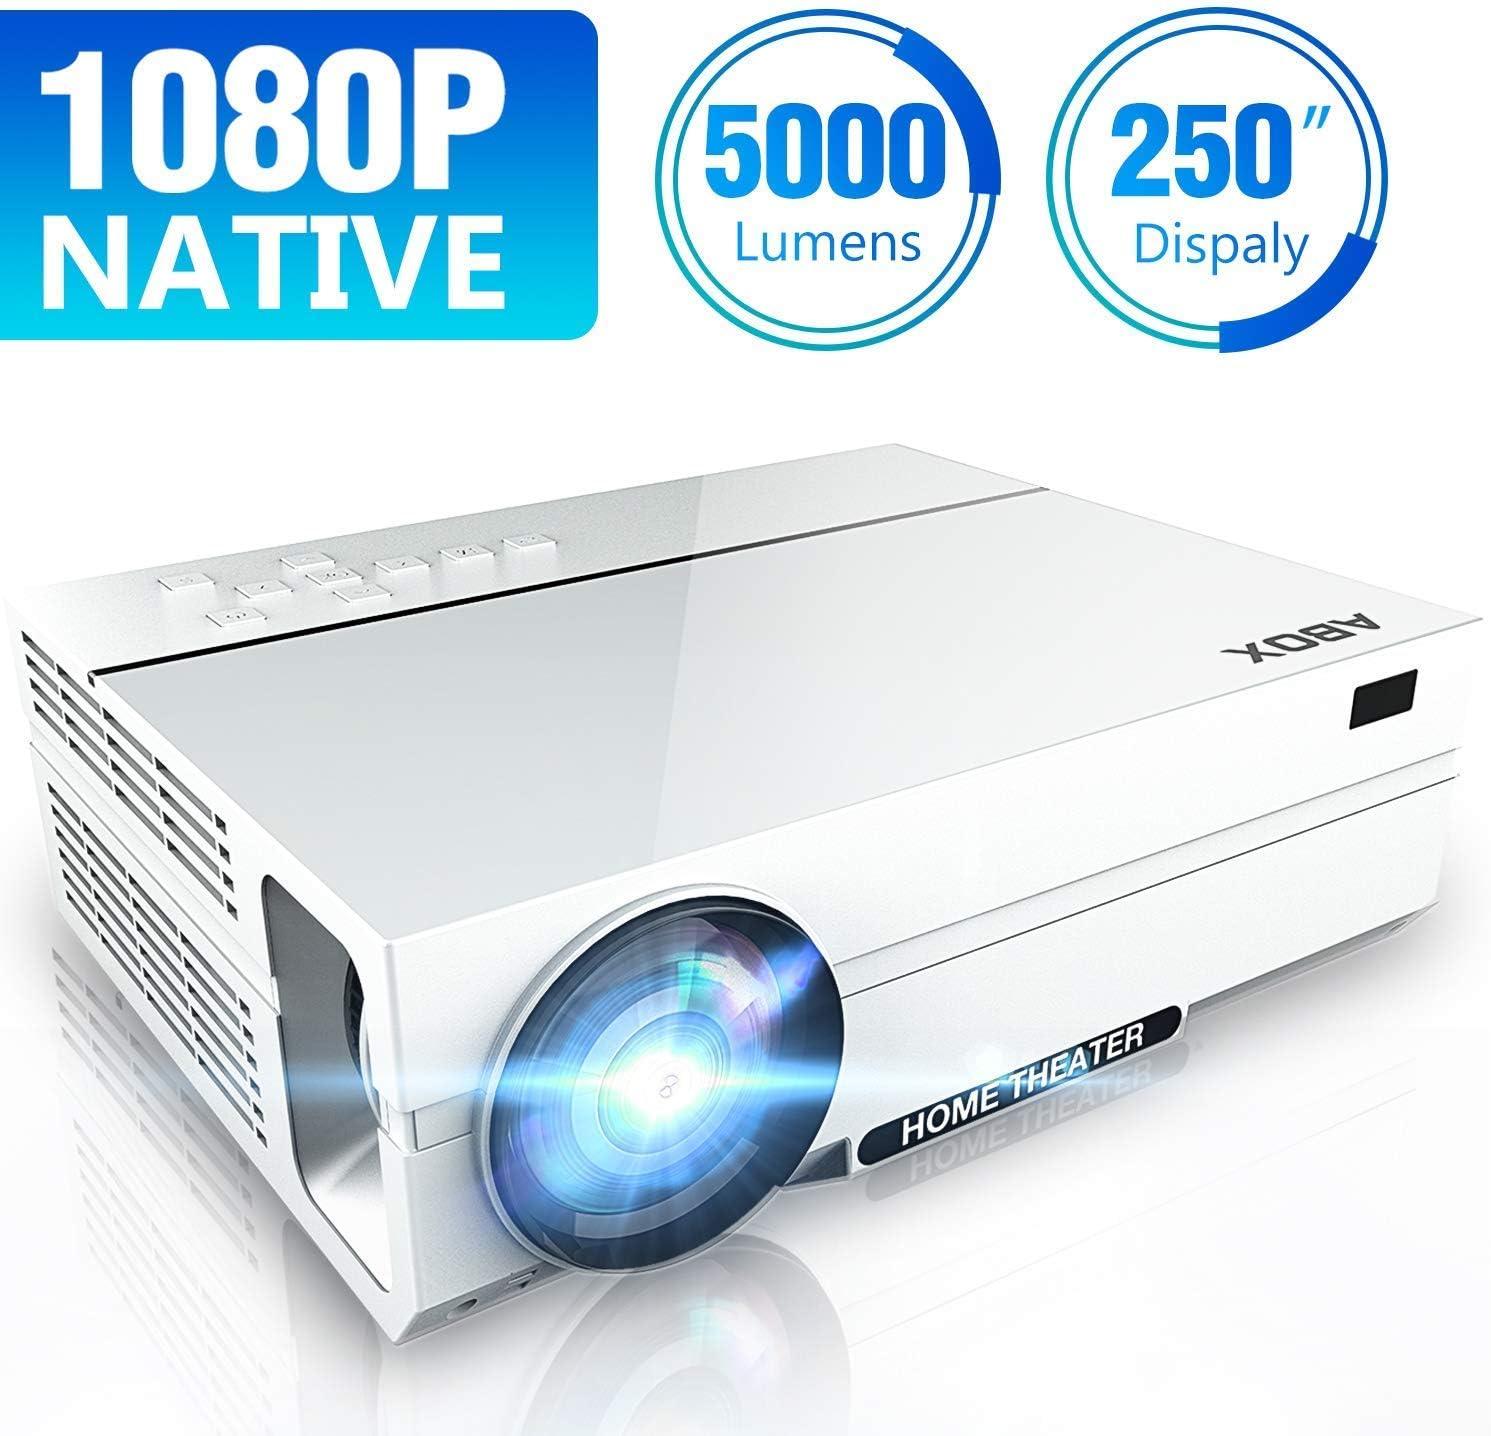 Actualizado] Proyector Full HD 1080p Nativo, Soporta 4K, 5000 ...